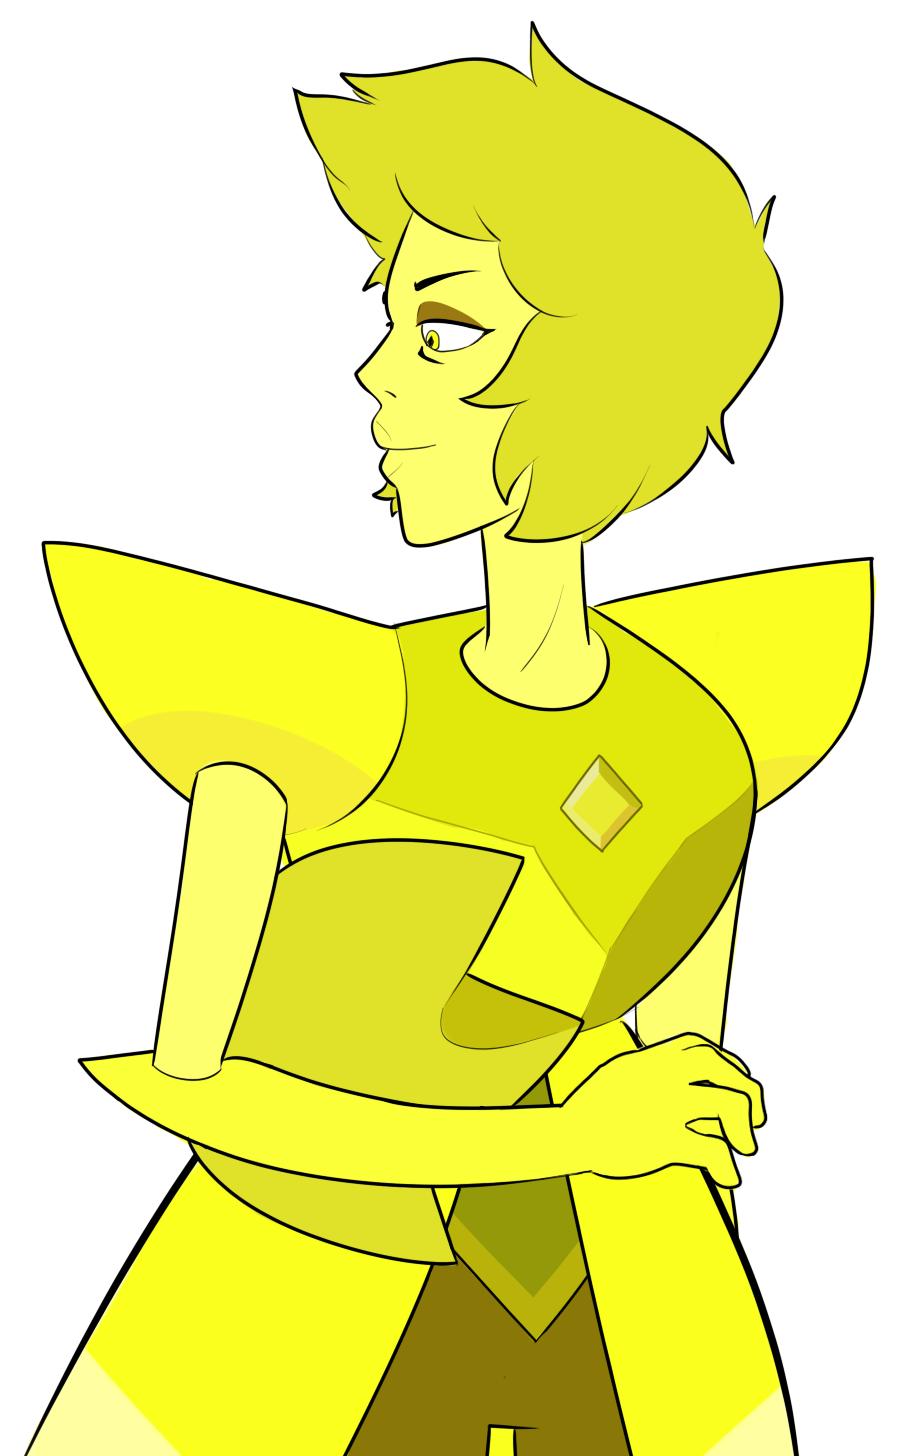 Imagen relacionada | Steven Universe: Diamantes | Pinterest | Steven ...